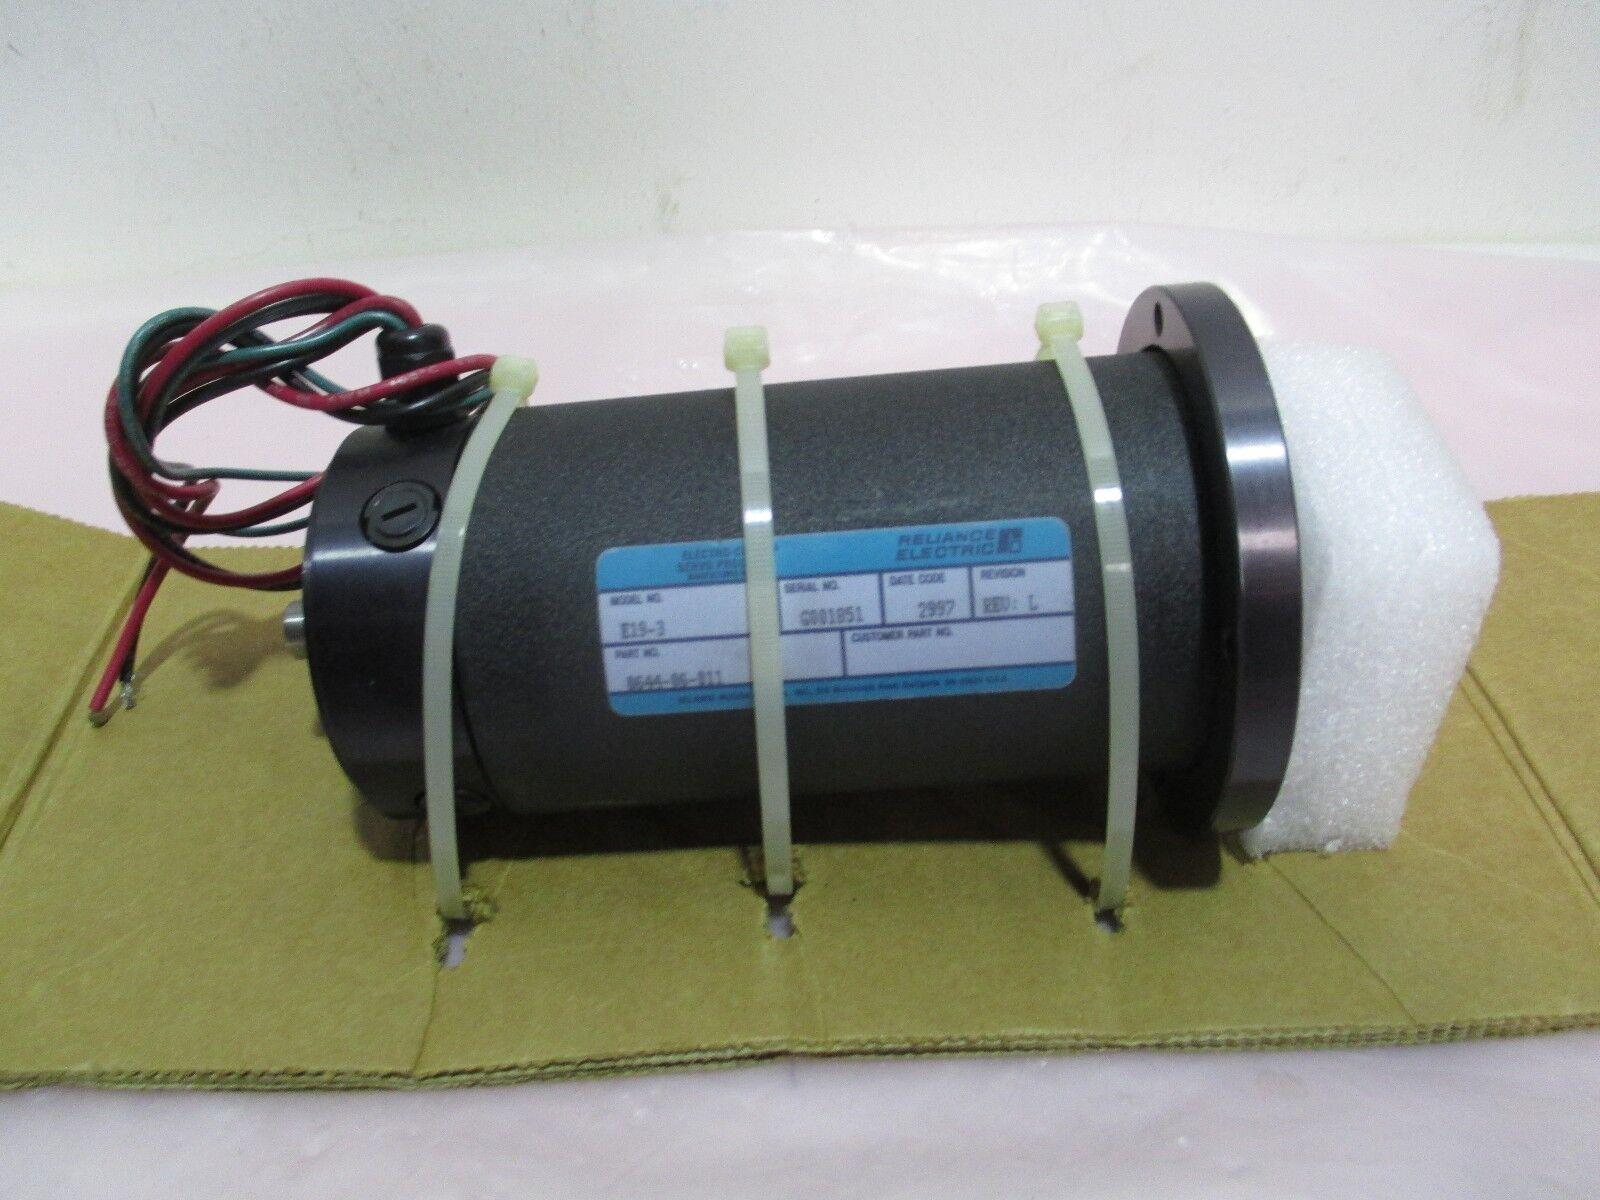 Reliance Electric 0644-06-011 Electrocraft Servo Motor, E19-3, 420973